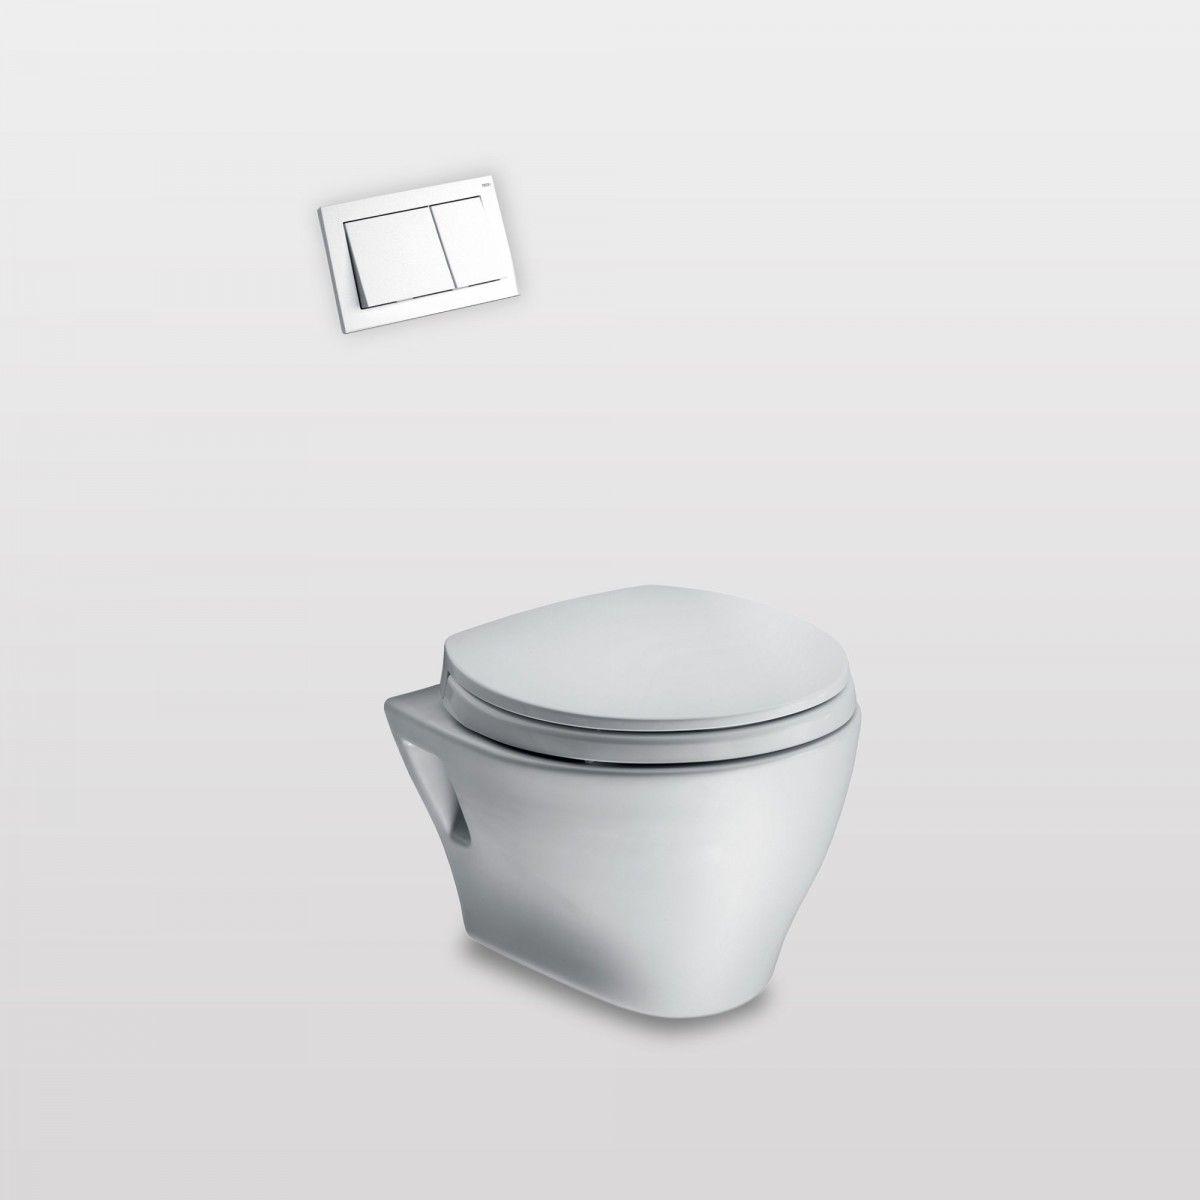 Toto Aquia Wall-Hung Bowl - Gingers   Arq   Pinterest   Toilet bowl ...